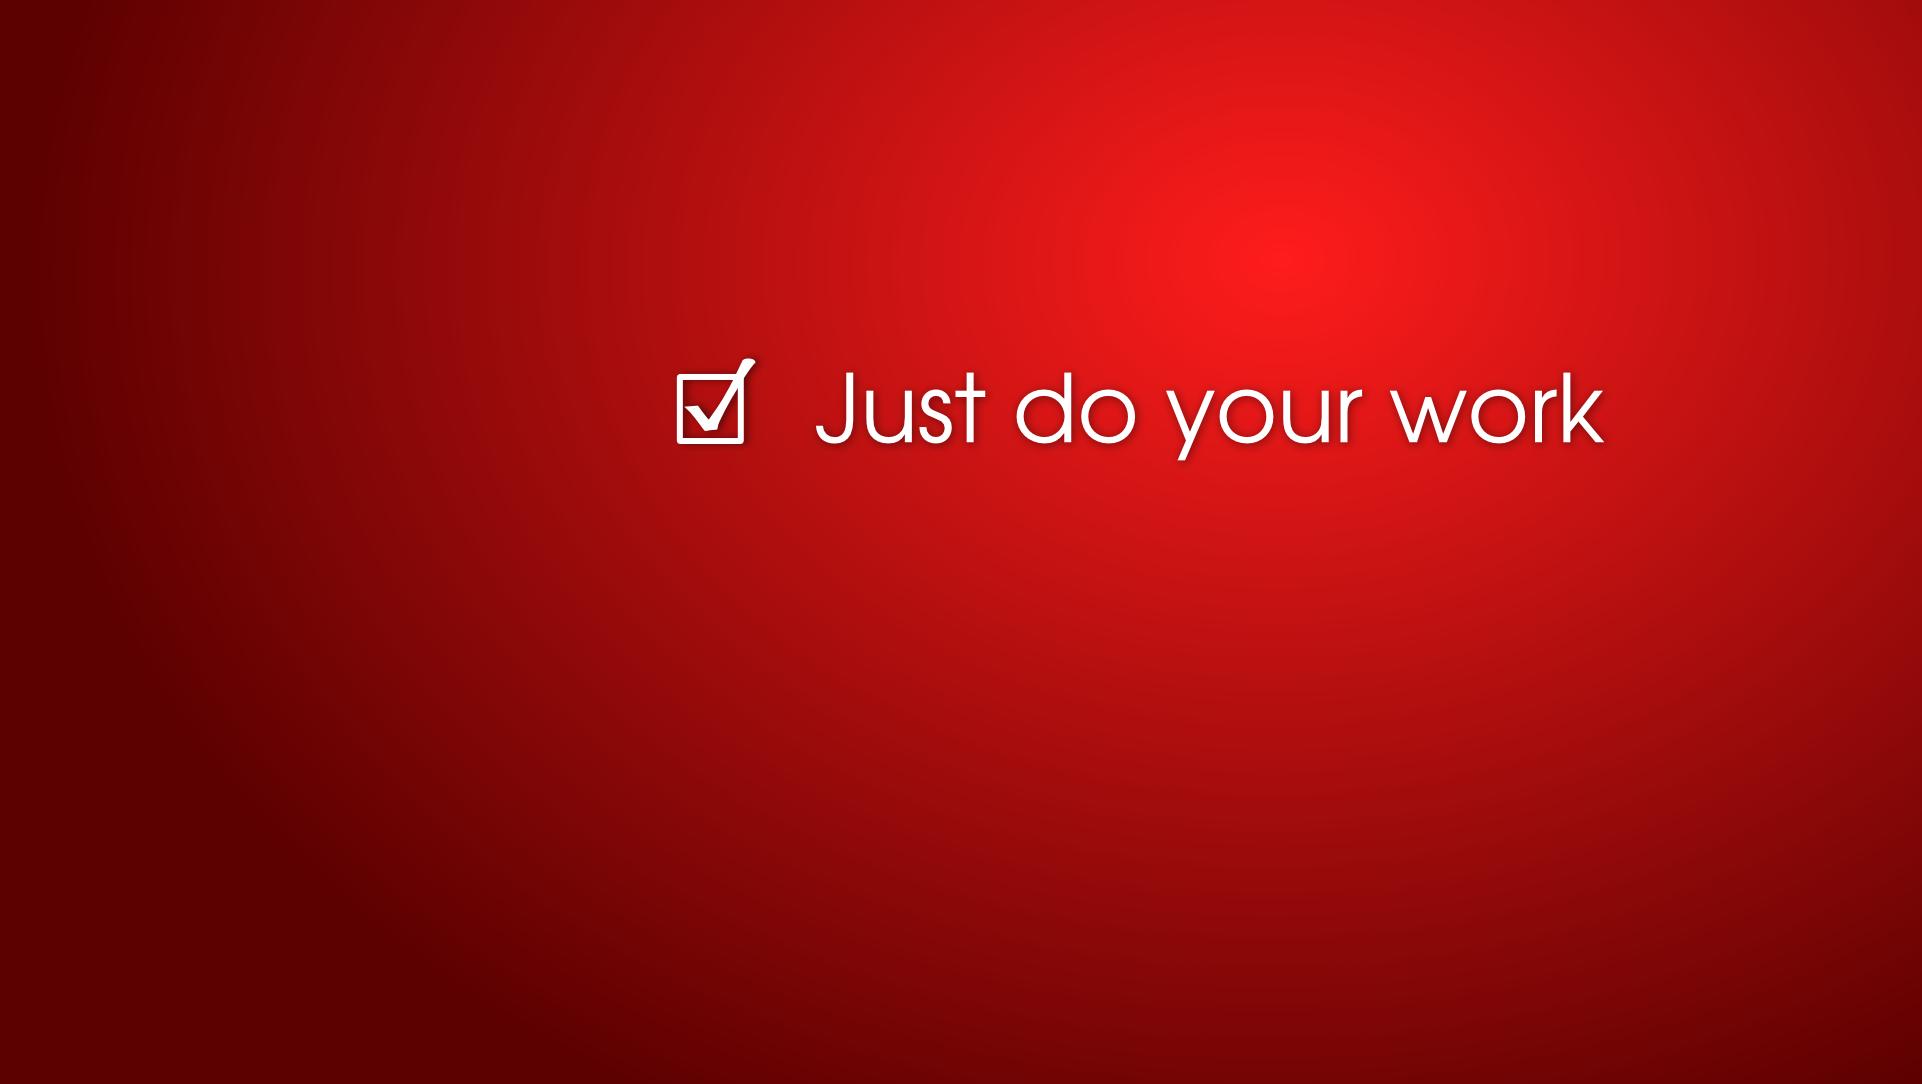 Do Your Work Wallpaper Sf Wallpaper